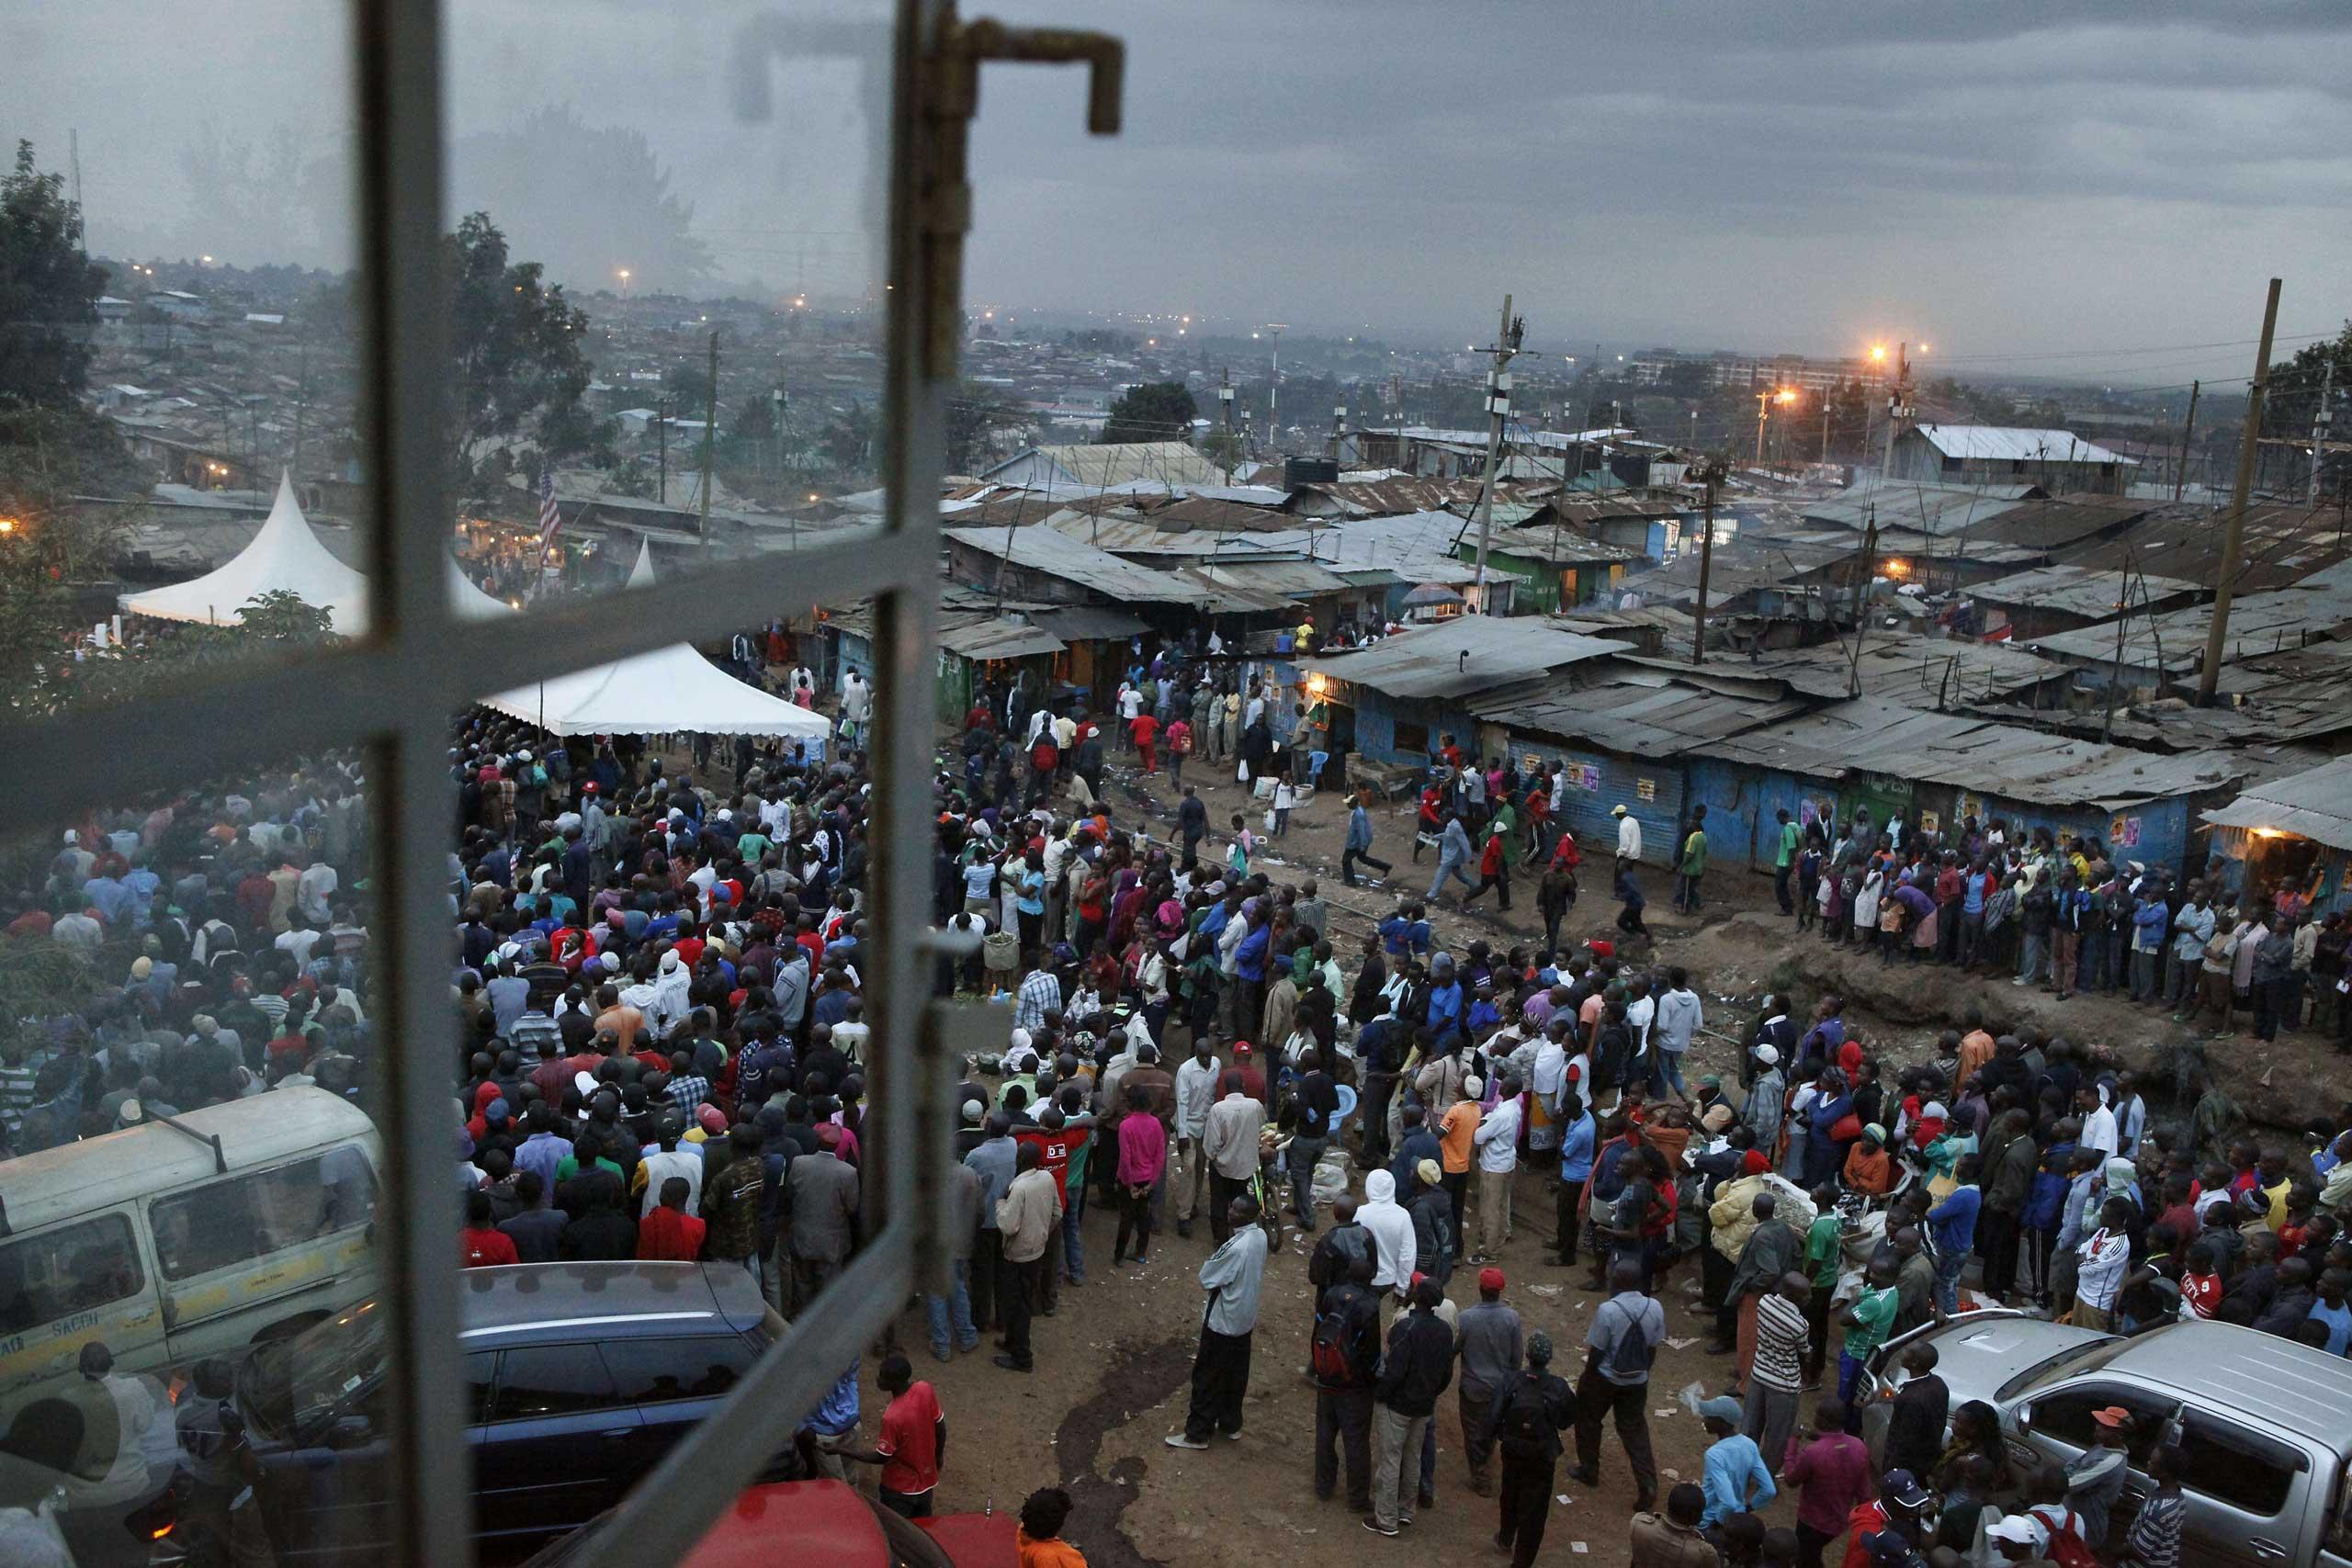 Crowds of Kenyans gather to celebrate the visit of President Barack Obama, at Kamukunji Grounds in Kibera neighborhood, Nairobi on July 24, 2015 .